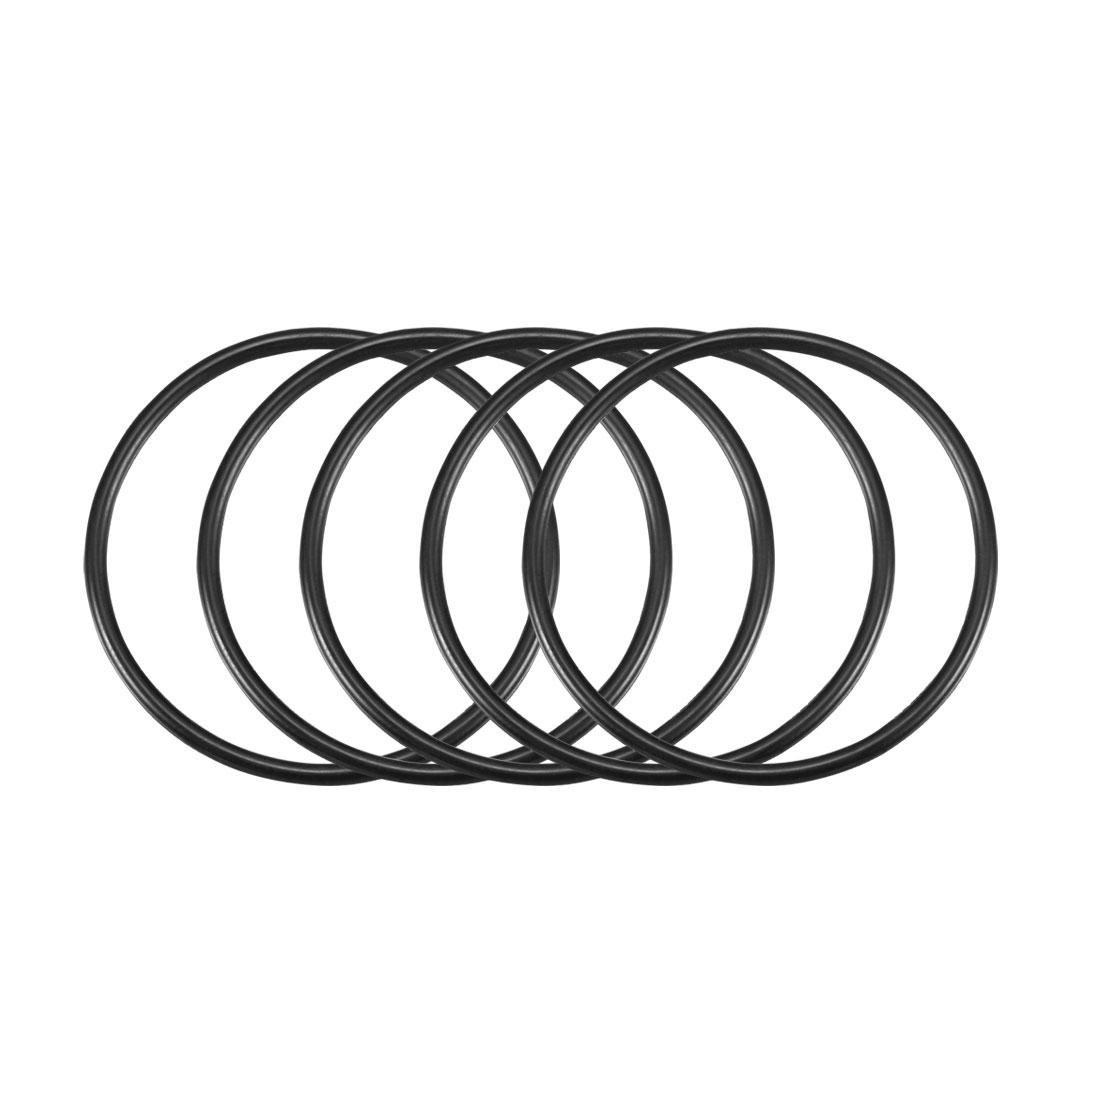 50 Pcs Black 38mm x 2mm NBR Oil Resistant Sealing Ring O-shape Grommets